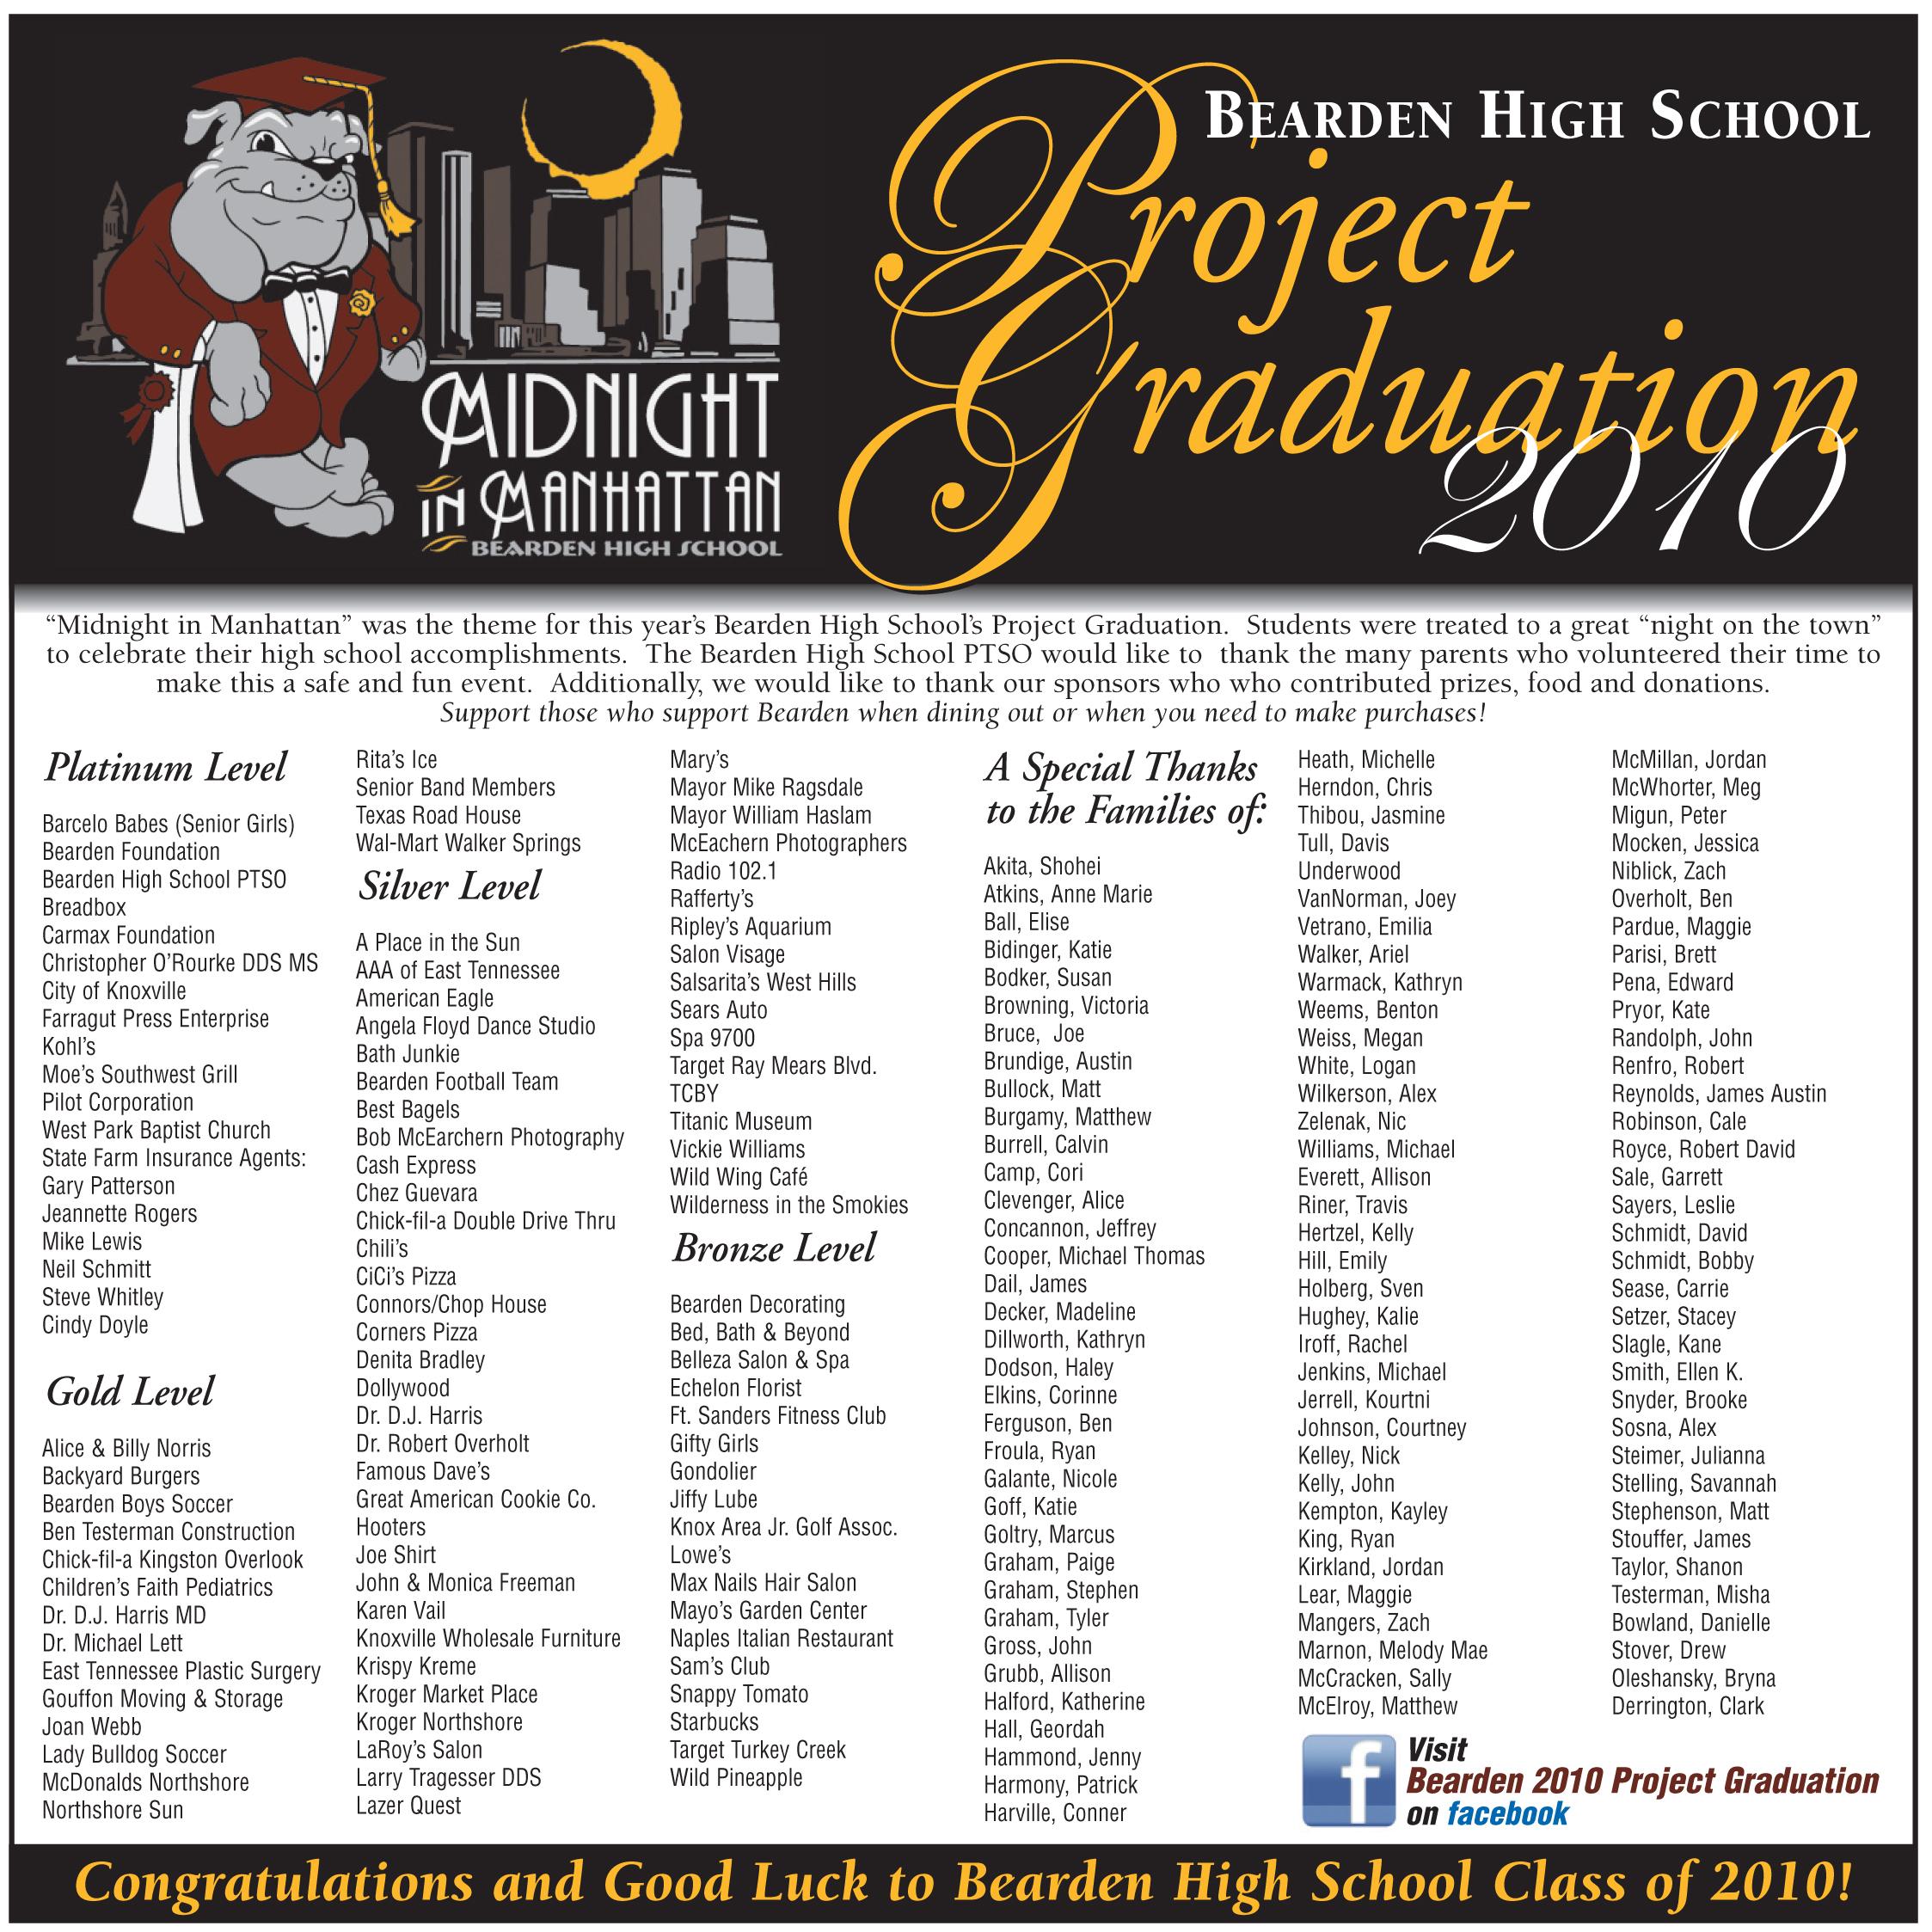 Bearden High School Project Graduation 2010